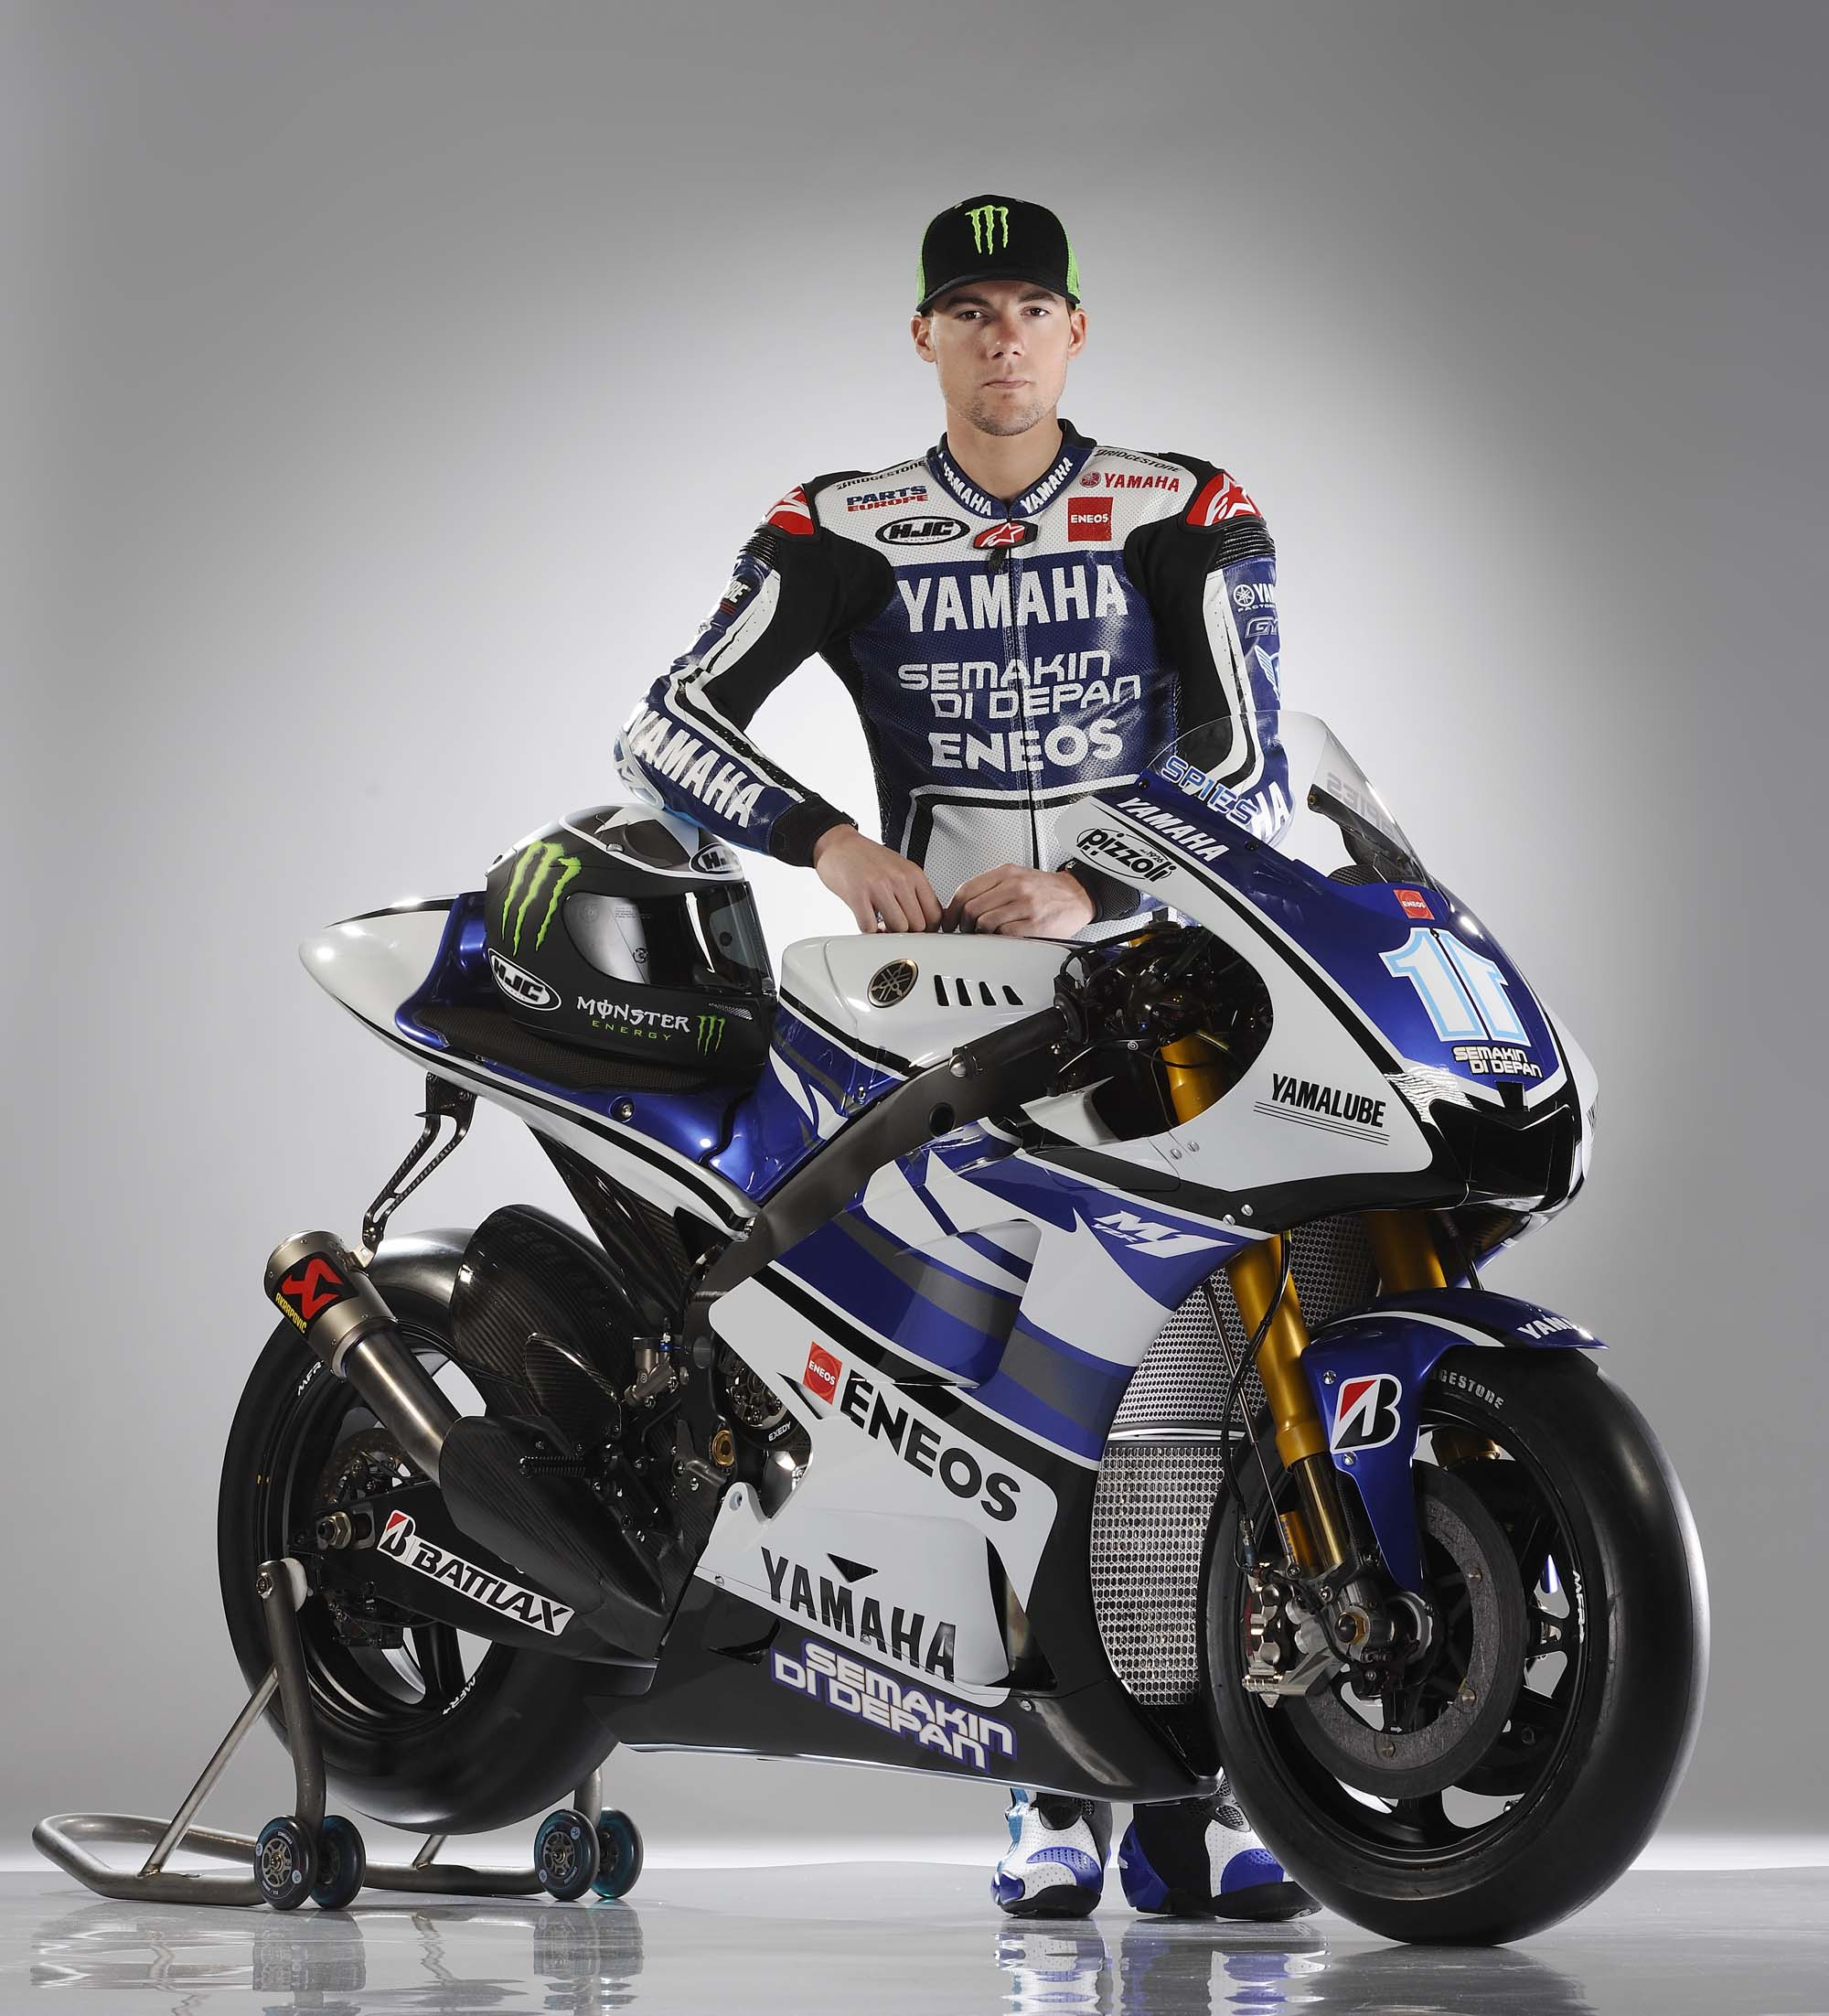 Moto GP Wallpapers